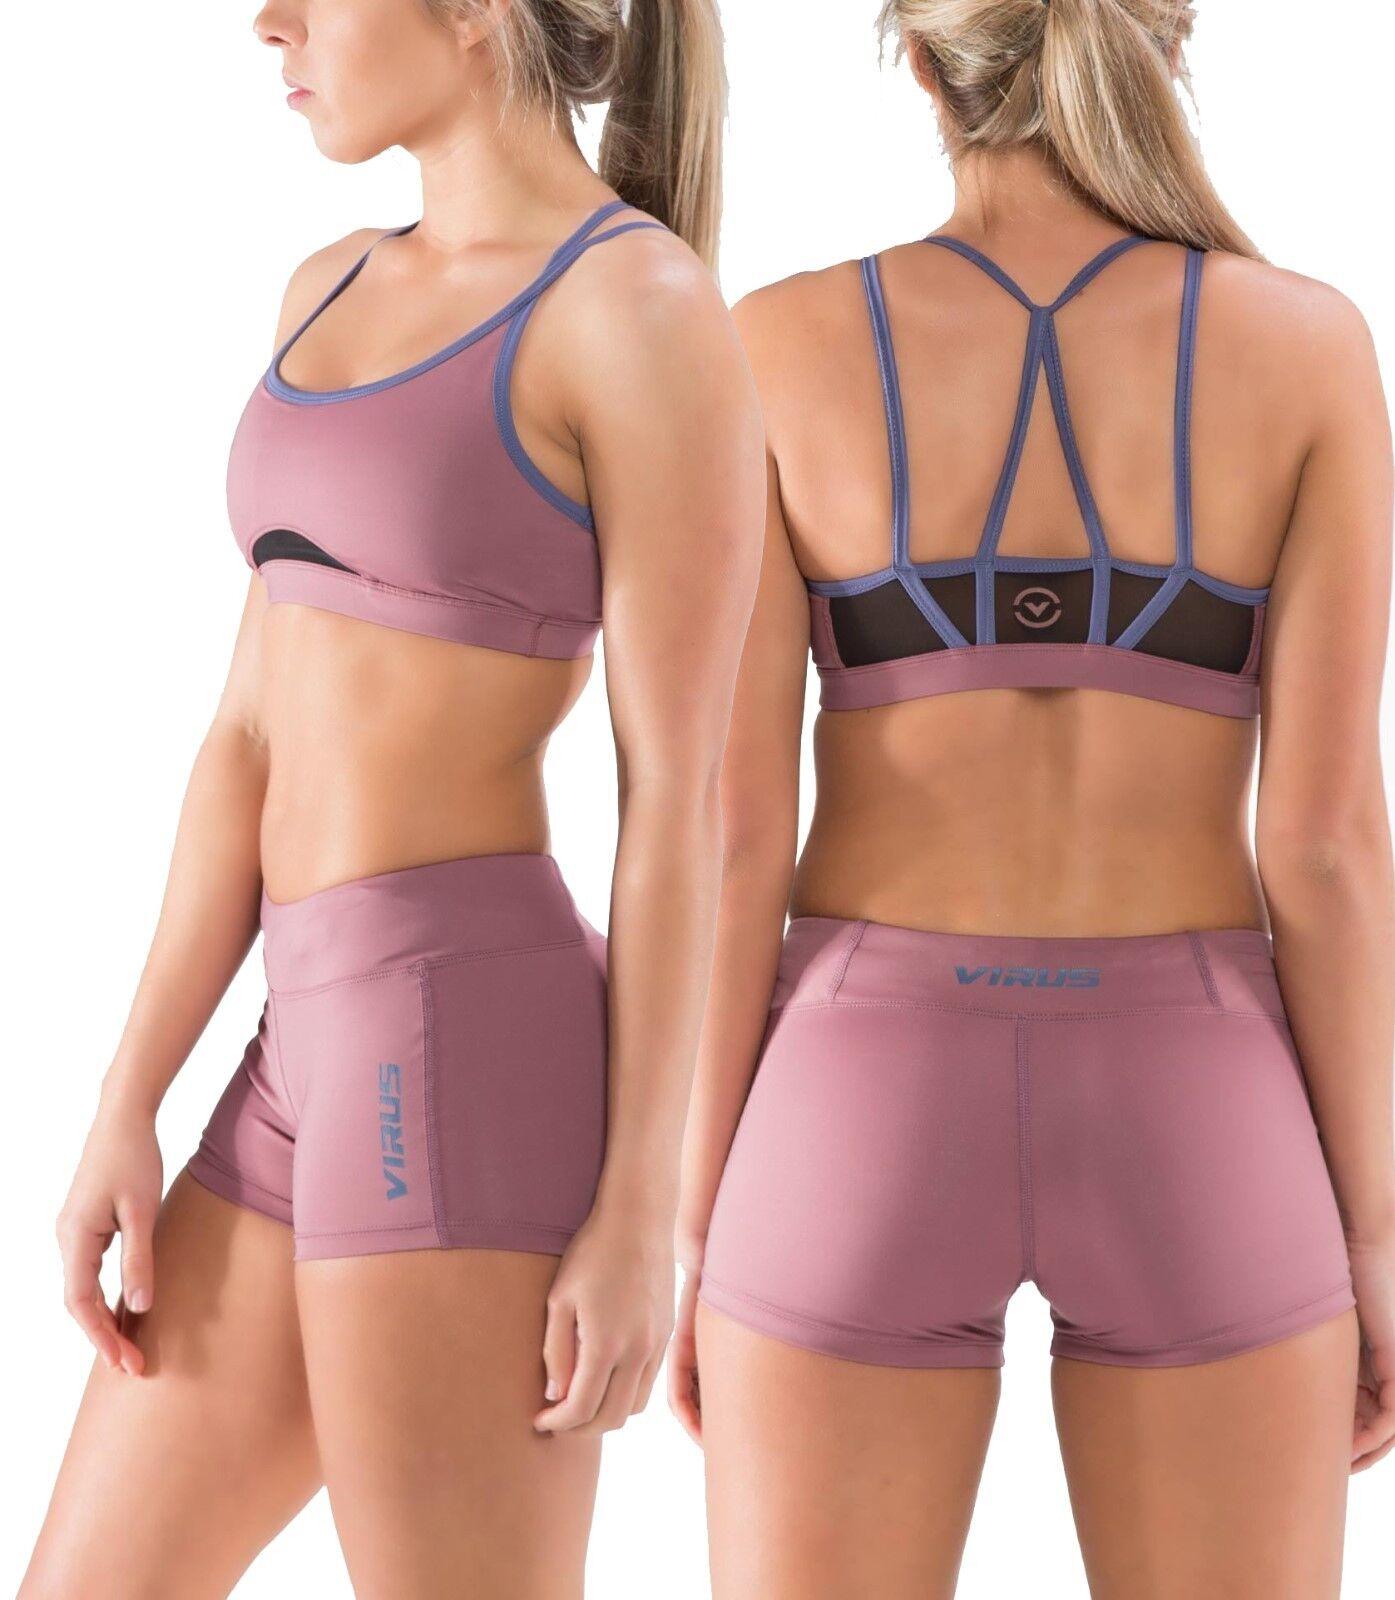 Virus ECo51 Womens Onyx Stay Cool Sports Bra,Crossfit ,Gym,Workout,Yoga,Running